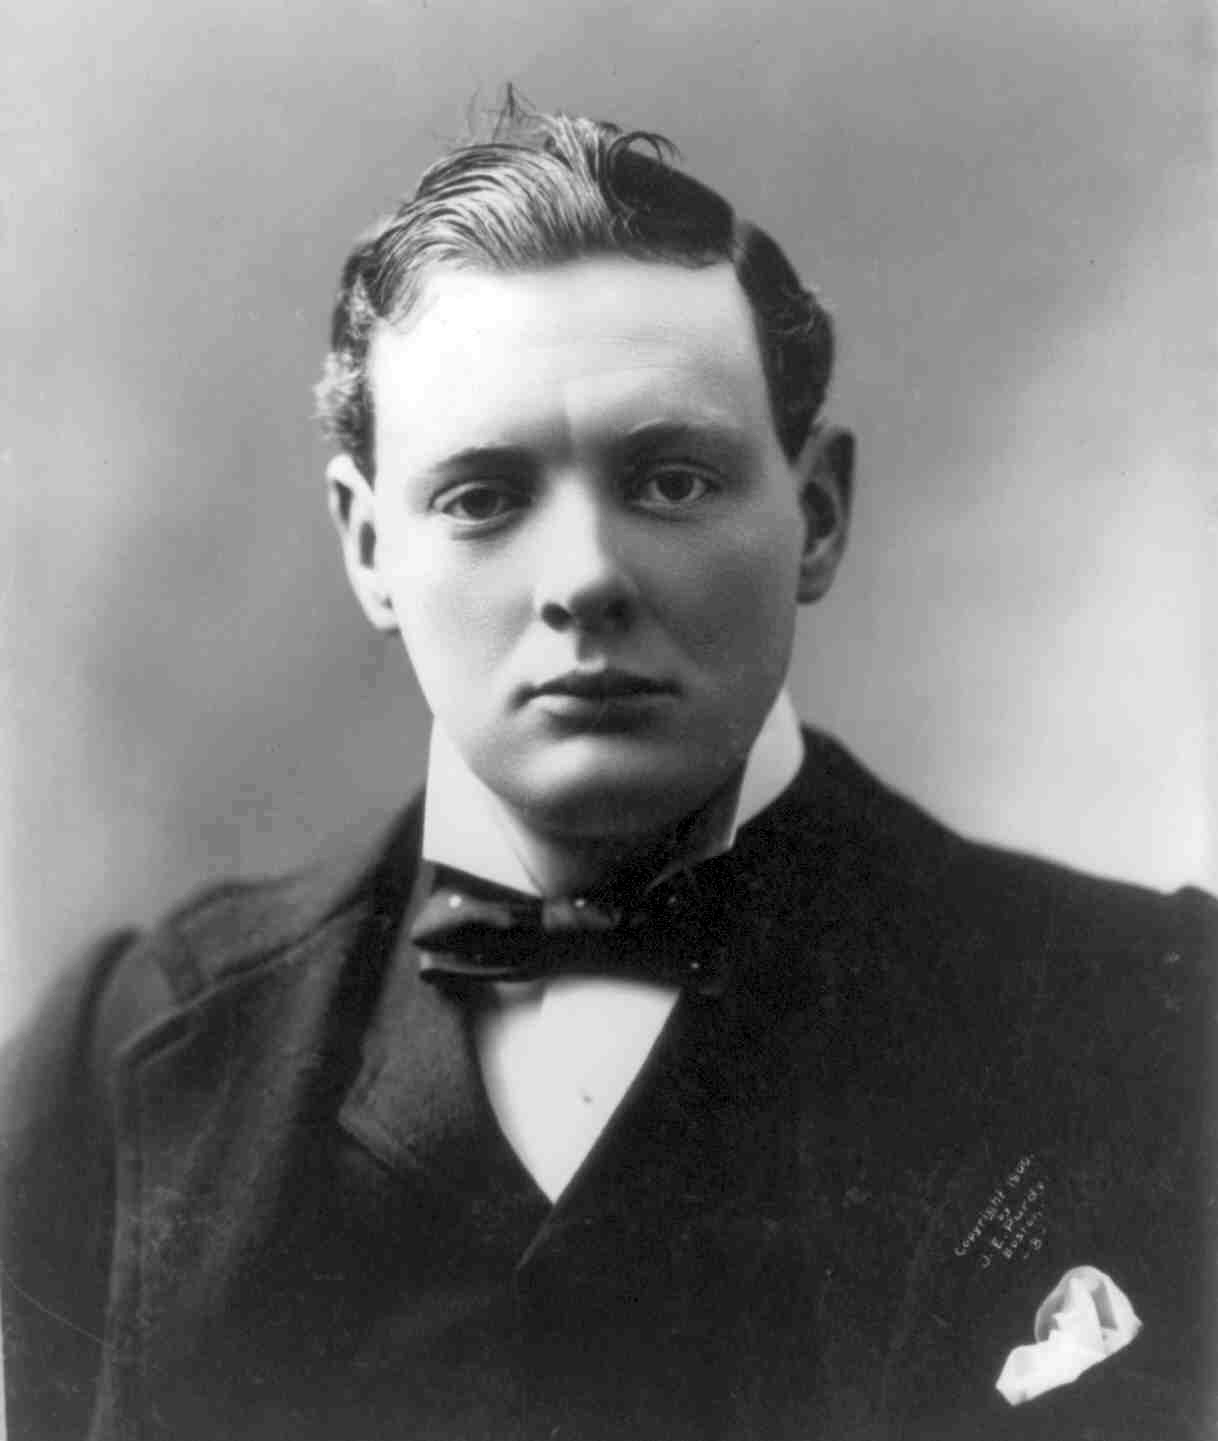 The early career of sir winston churchill